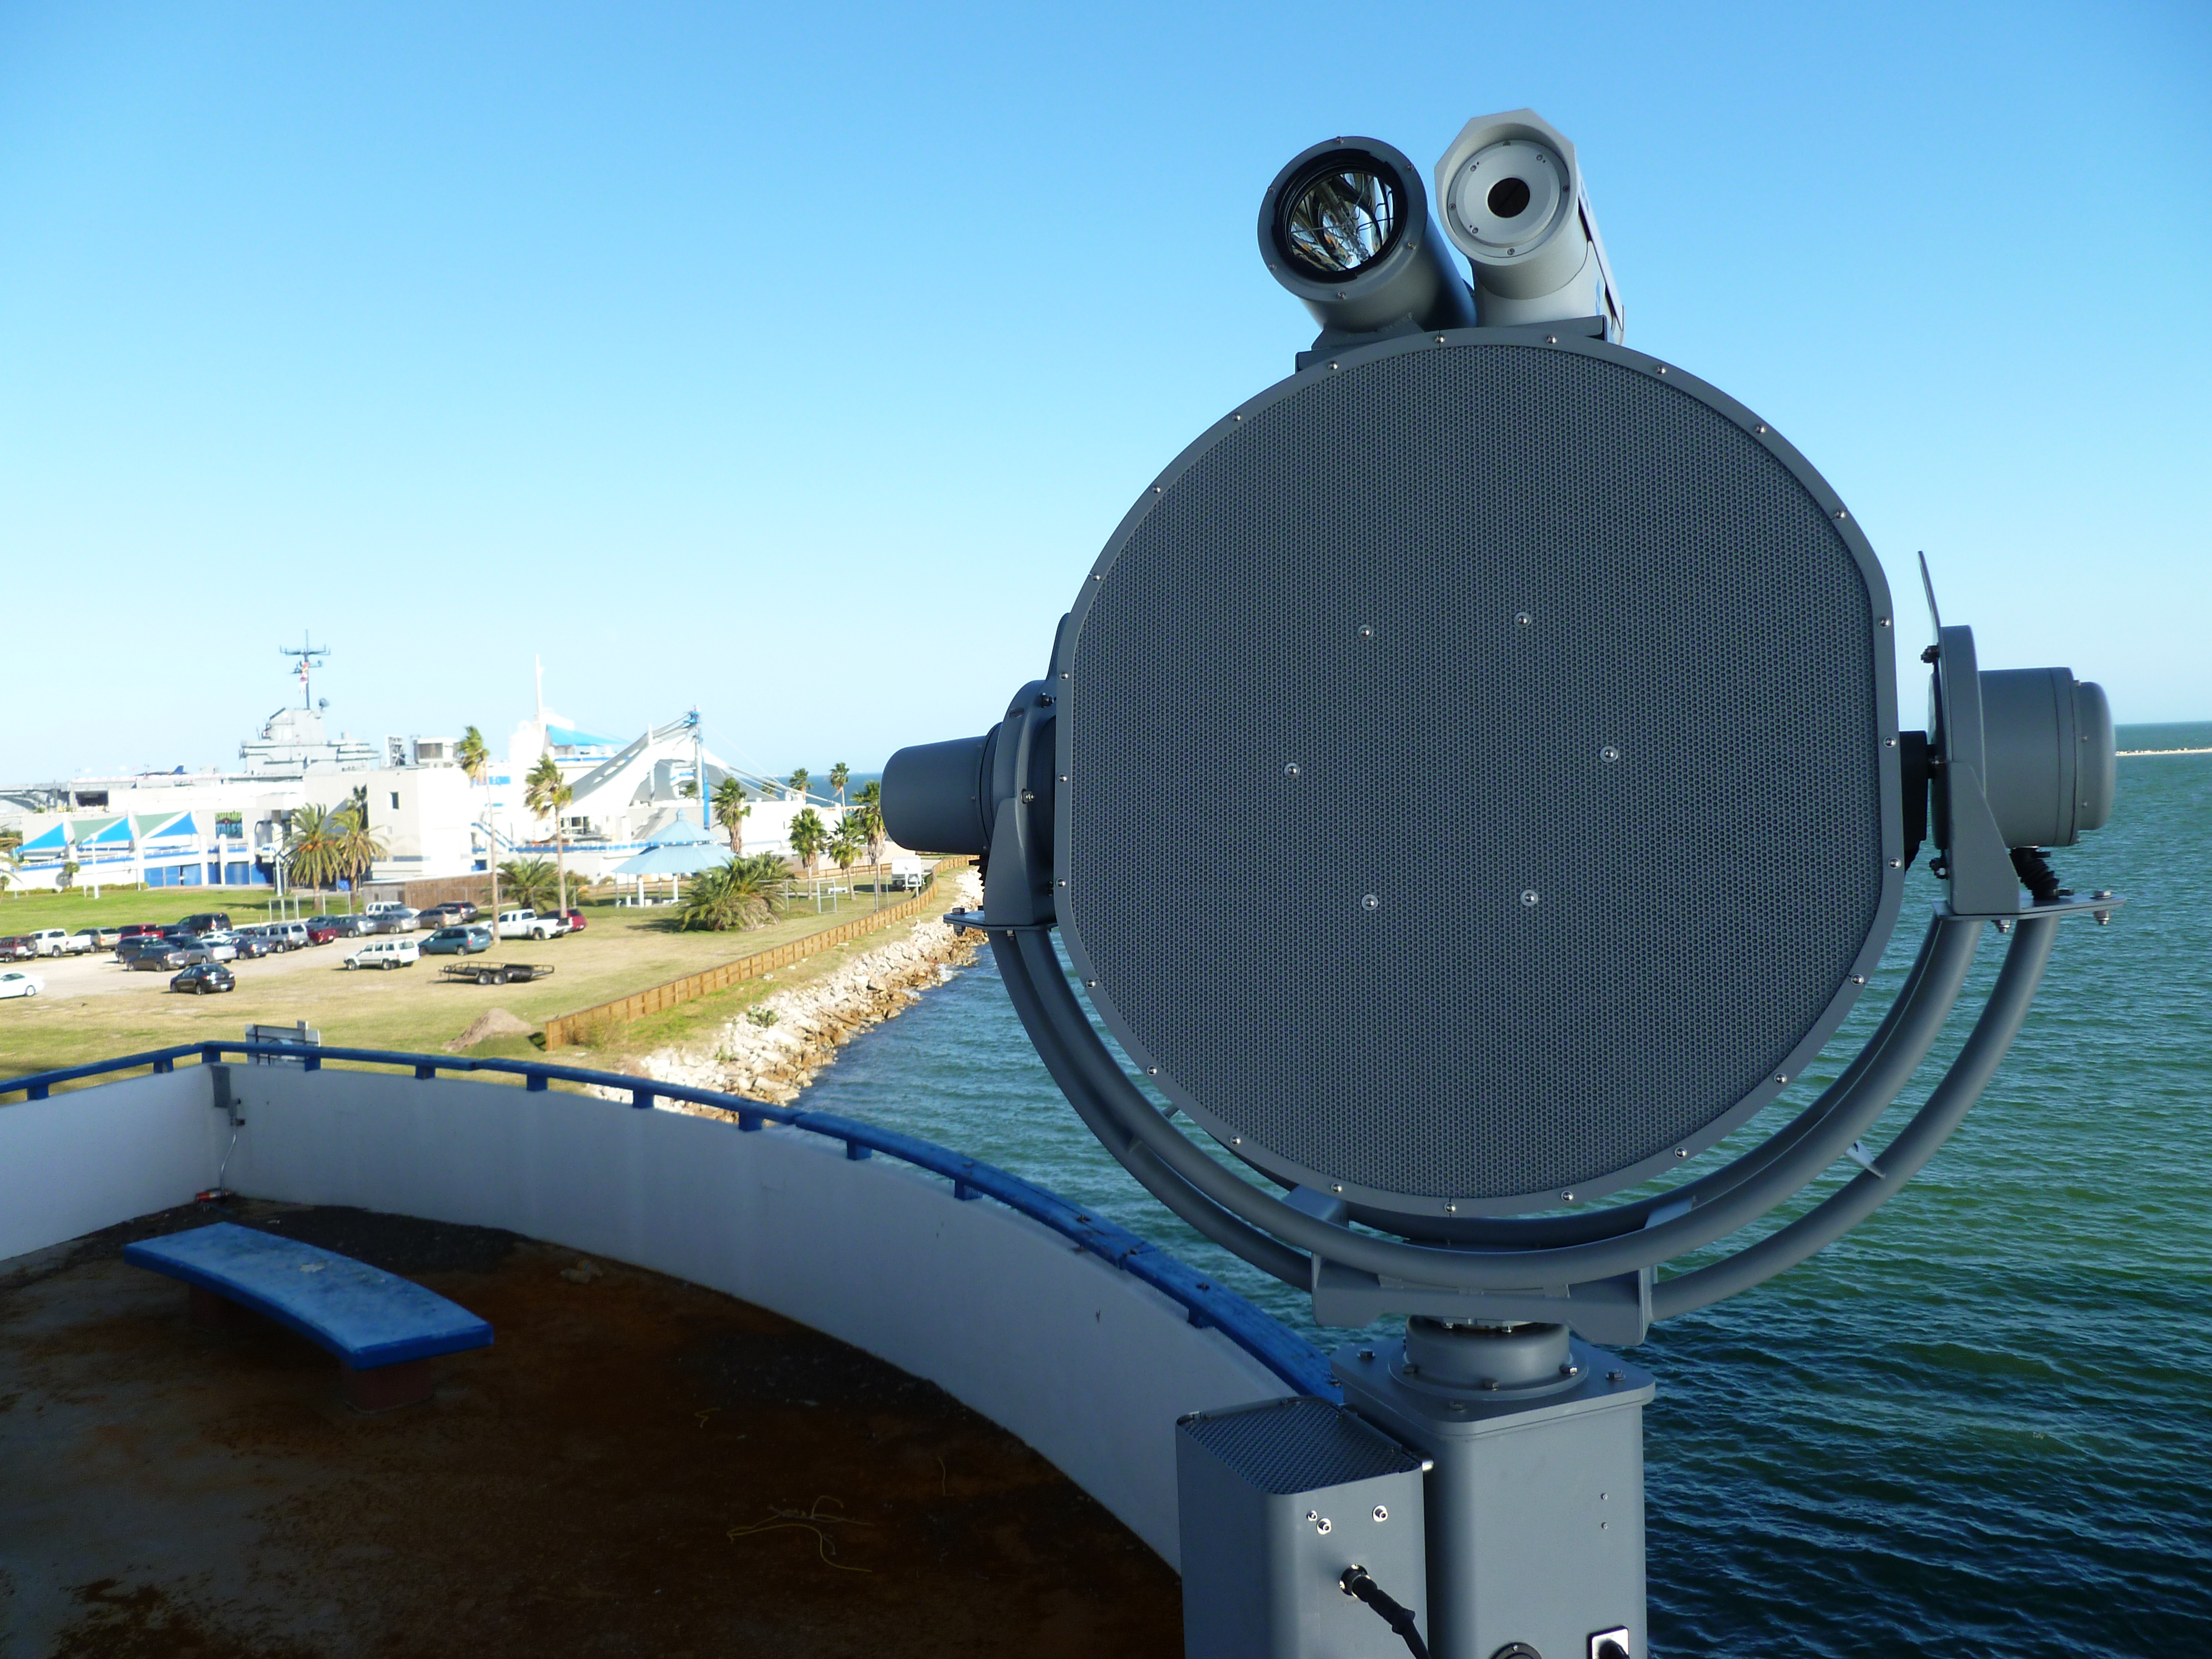 1000RX on Naval Vessel